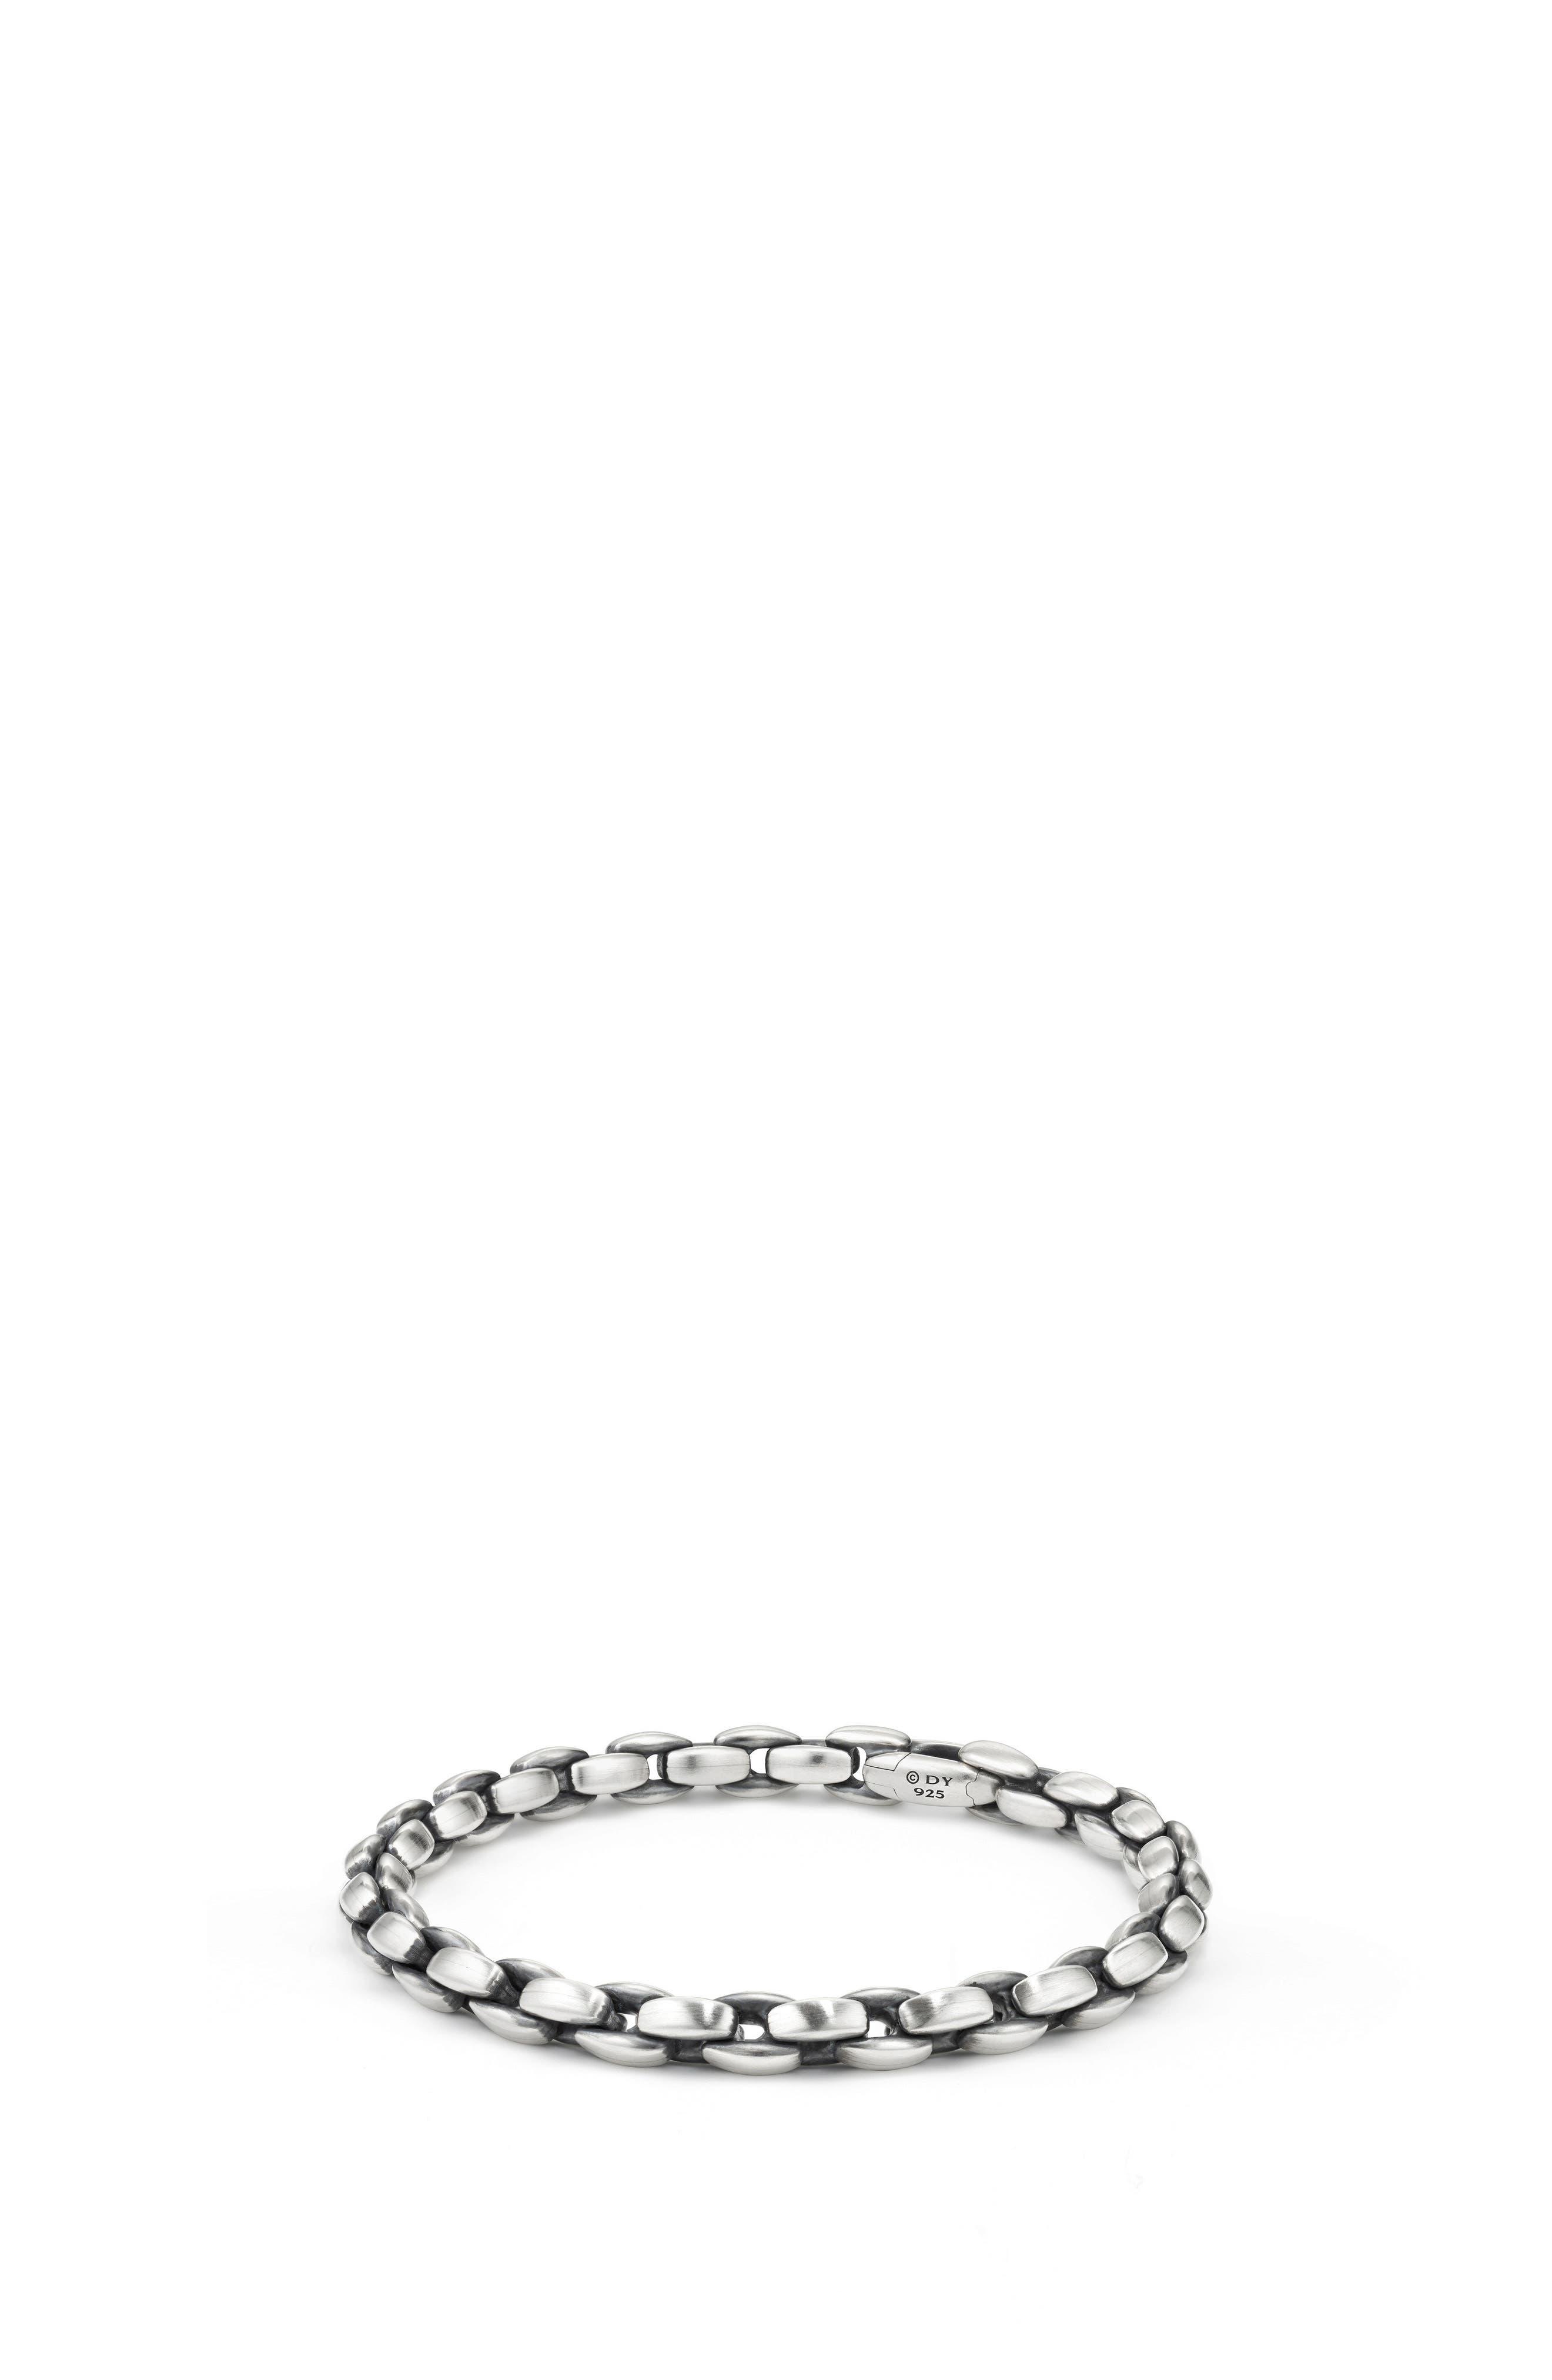 David Yurman Elongated Box Chain Bracelet, 6mm